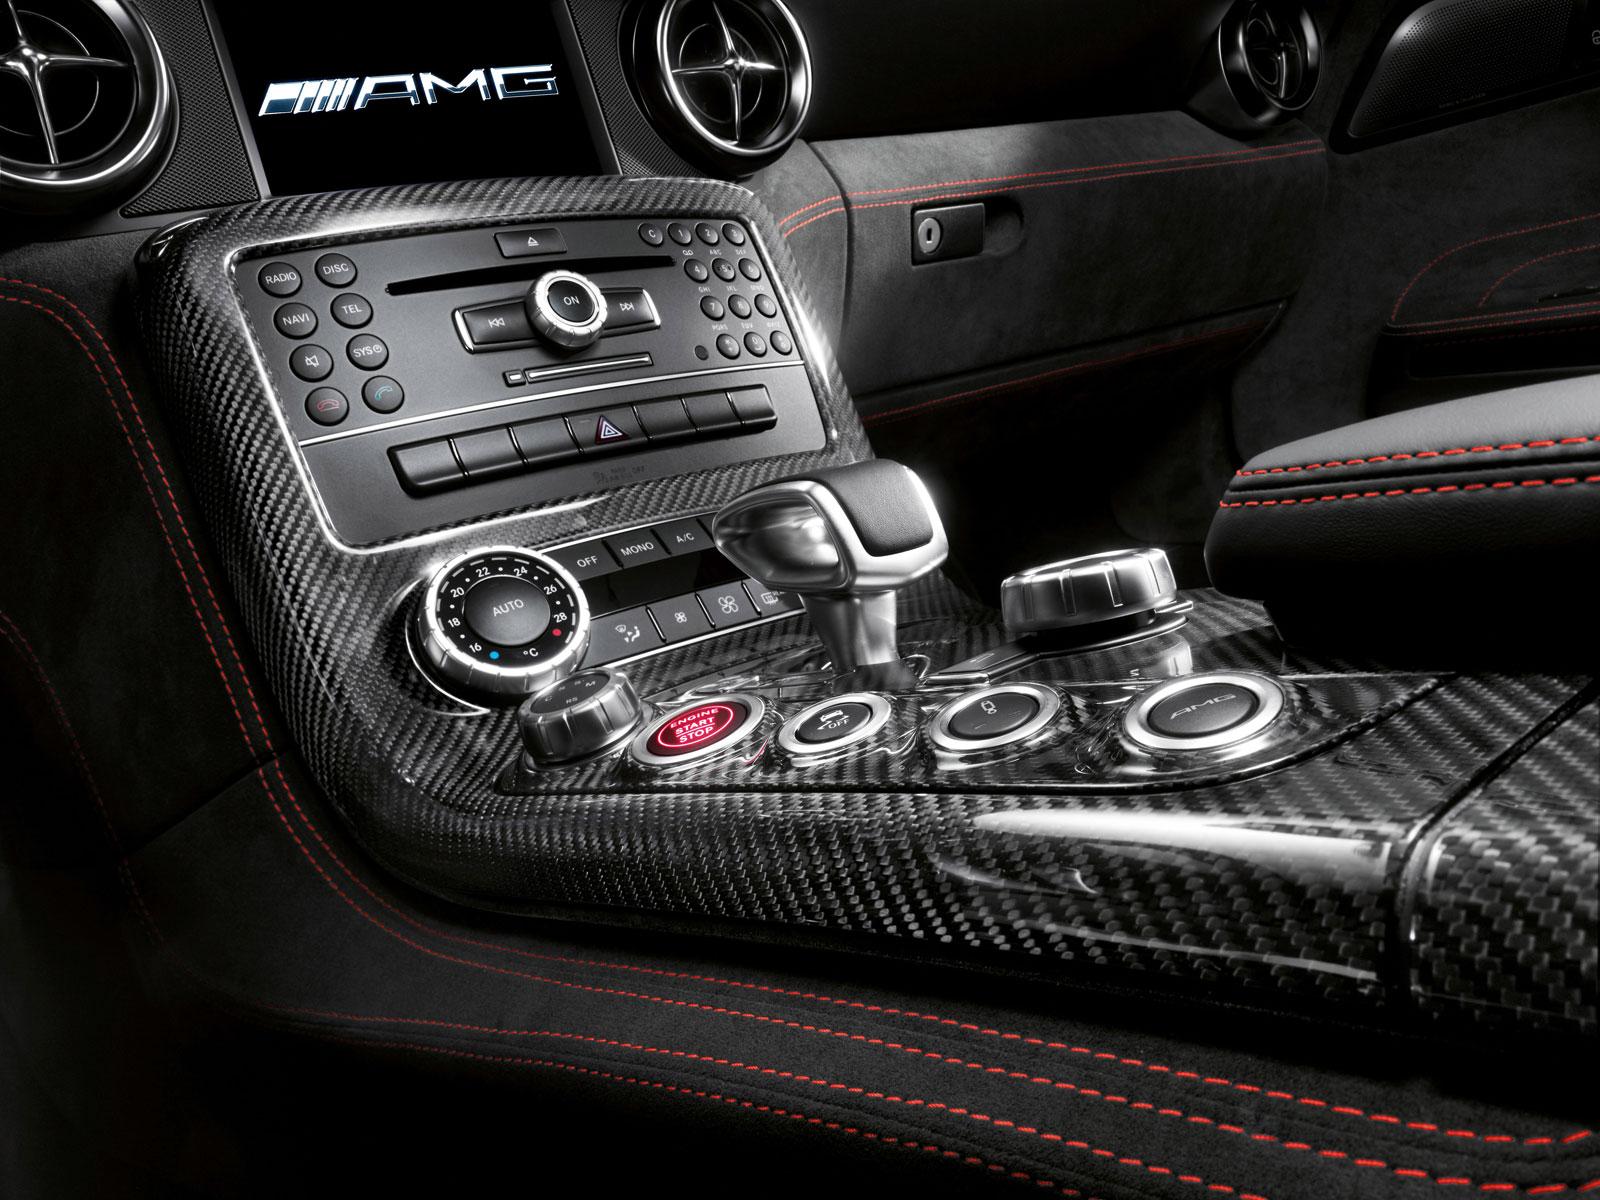 Mercedes-Benz SLS AMG Black Series Interior Center Tunnel - Car Body ...